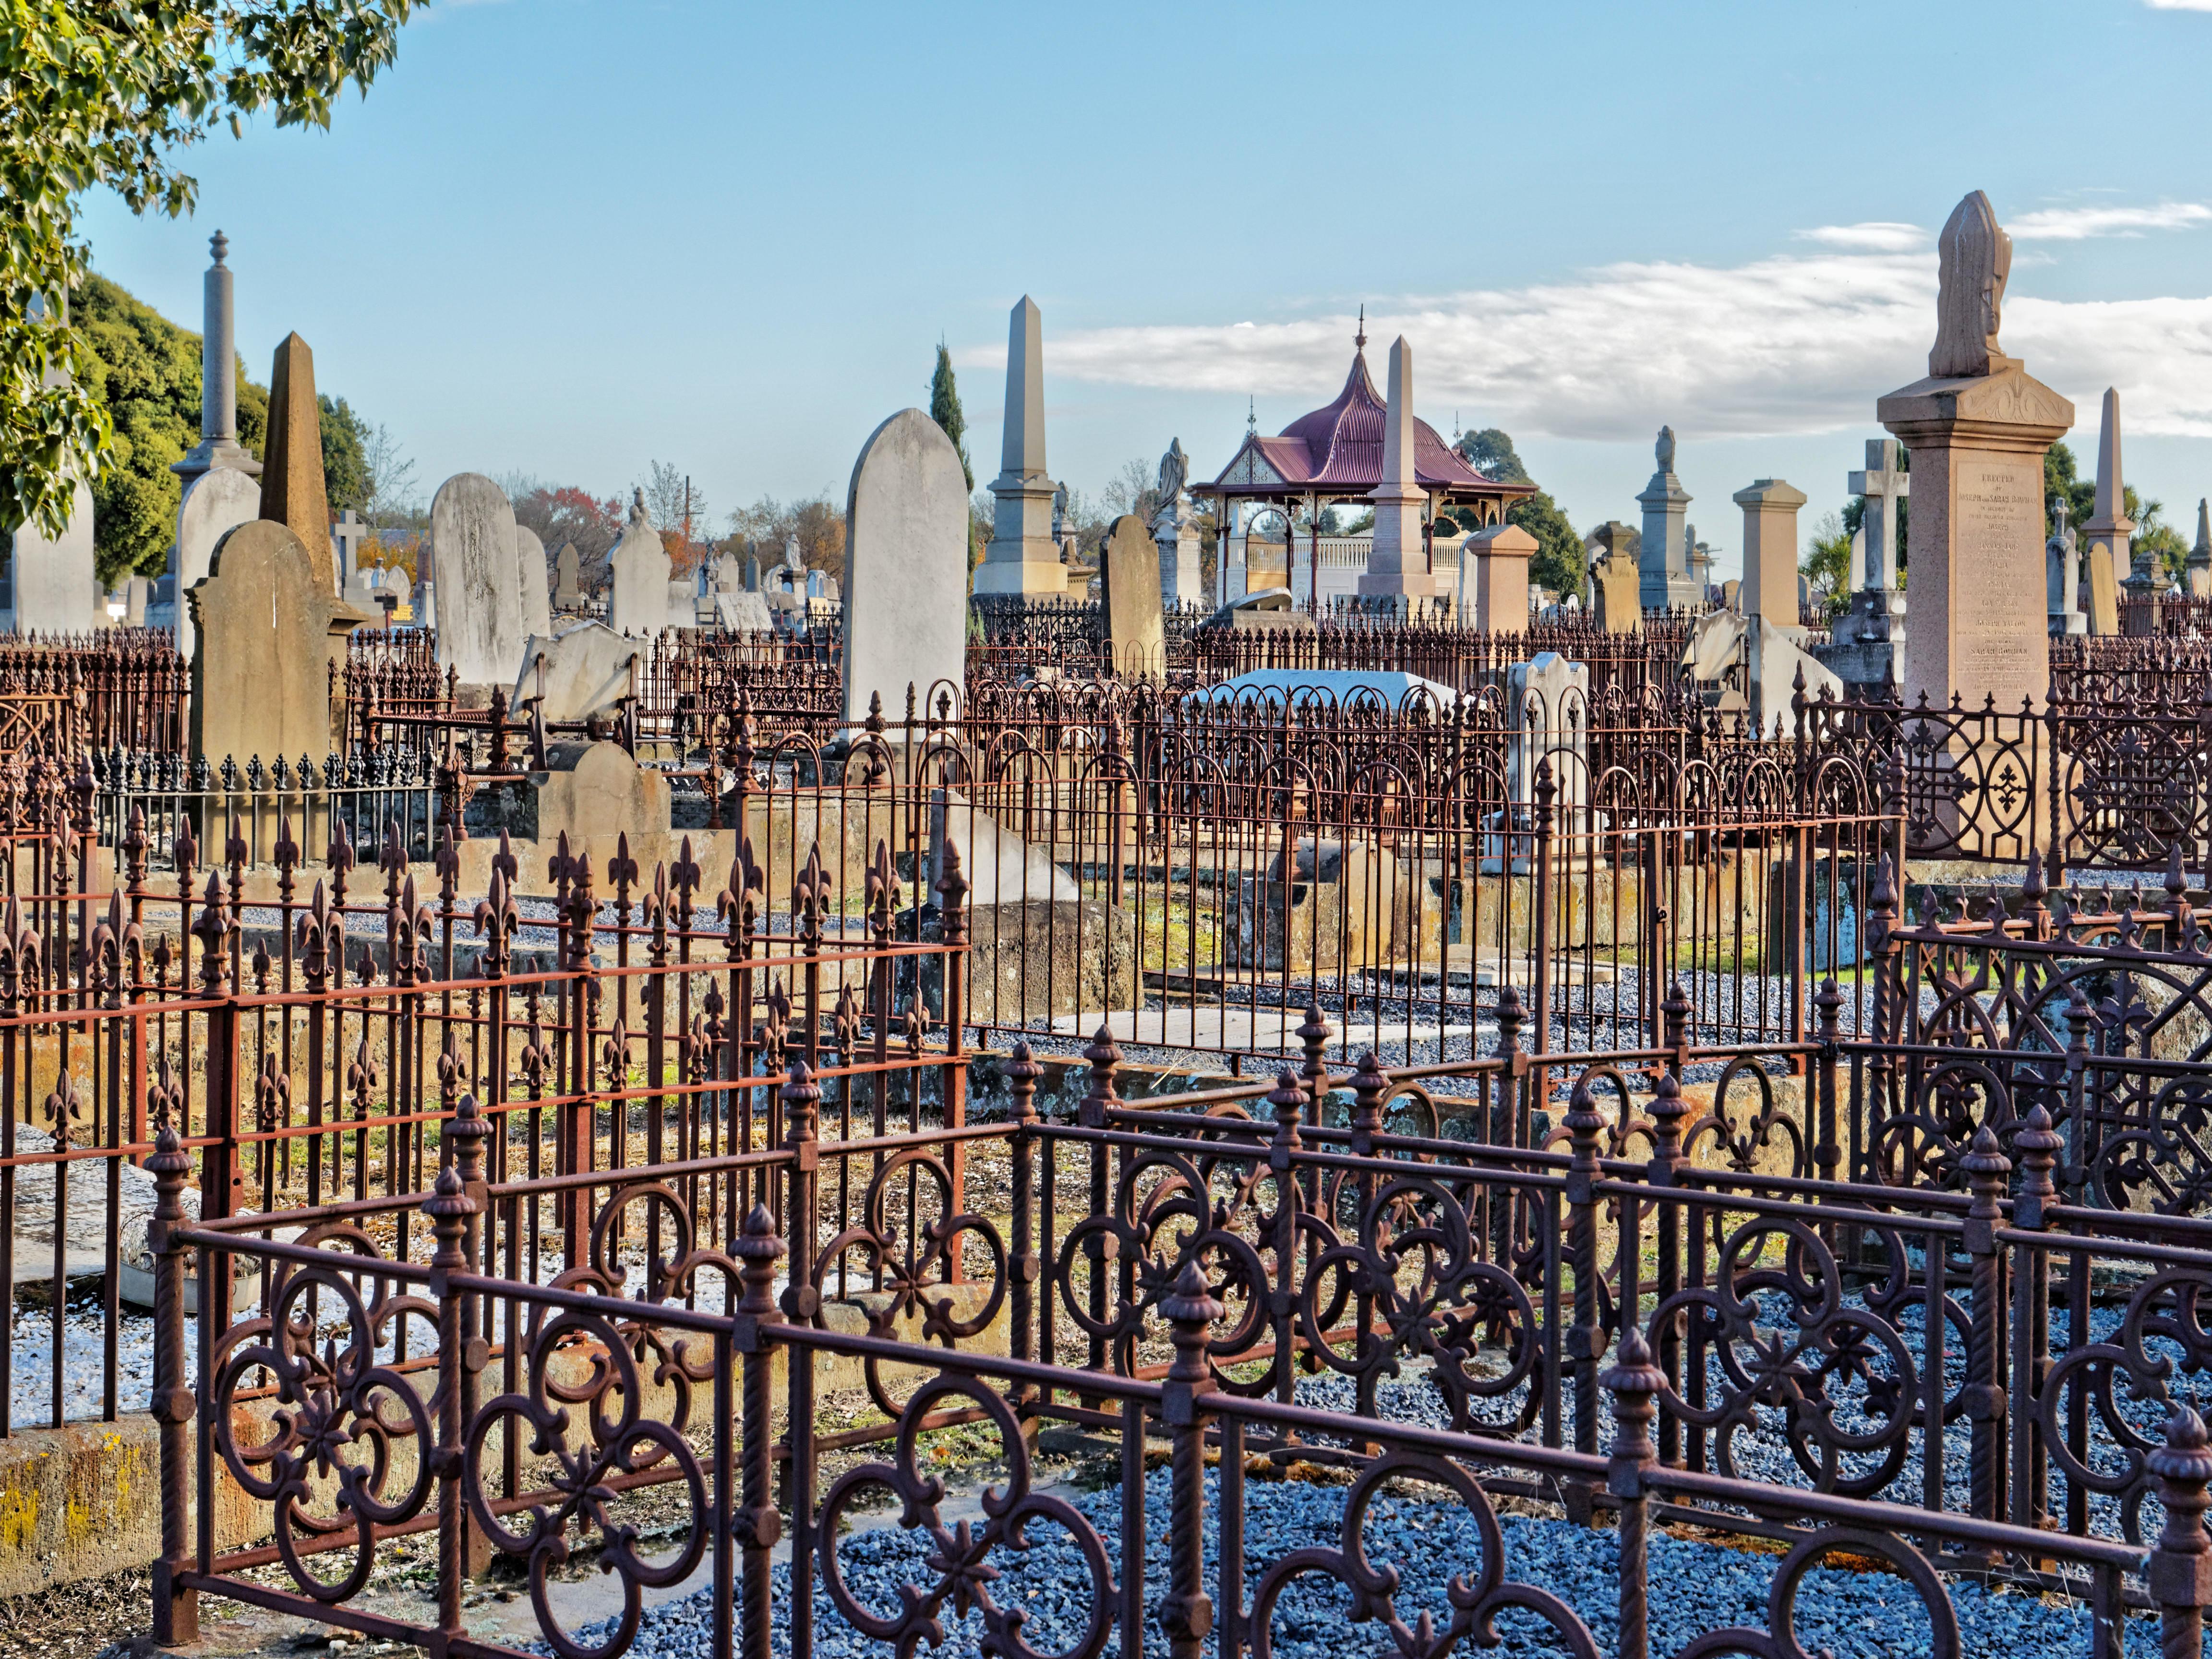 Cemetery-1.jpeg